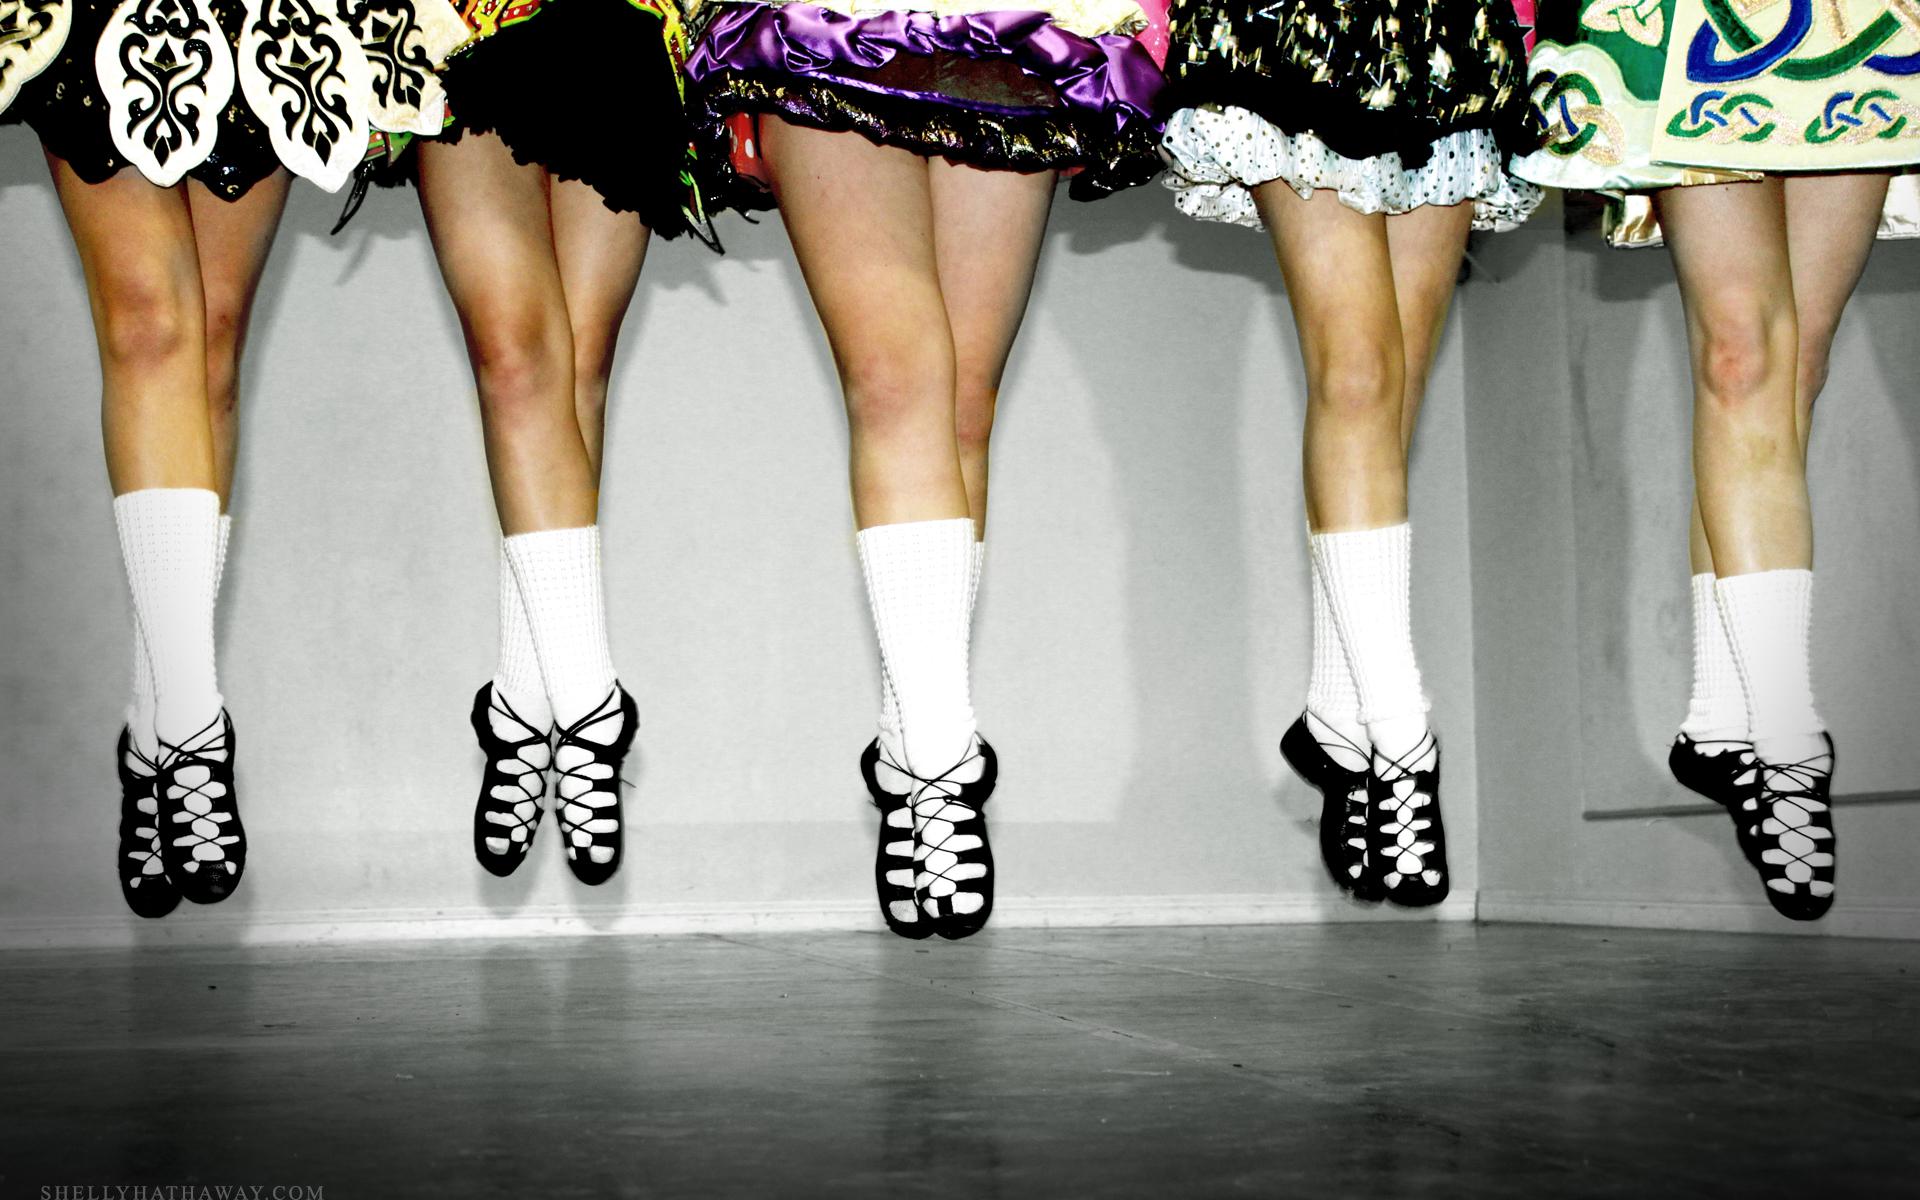 635697207616117707382022381_irish_dance_group_jump_wallpaper_1920x1200